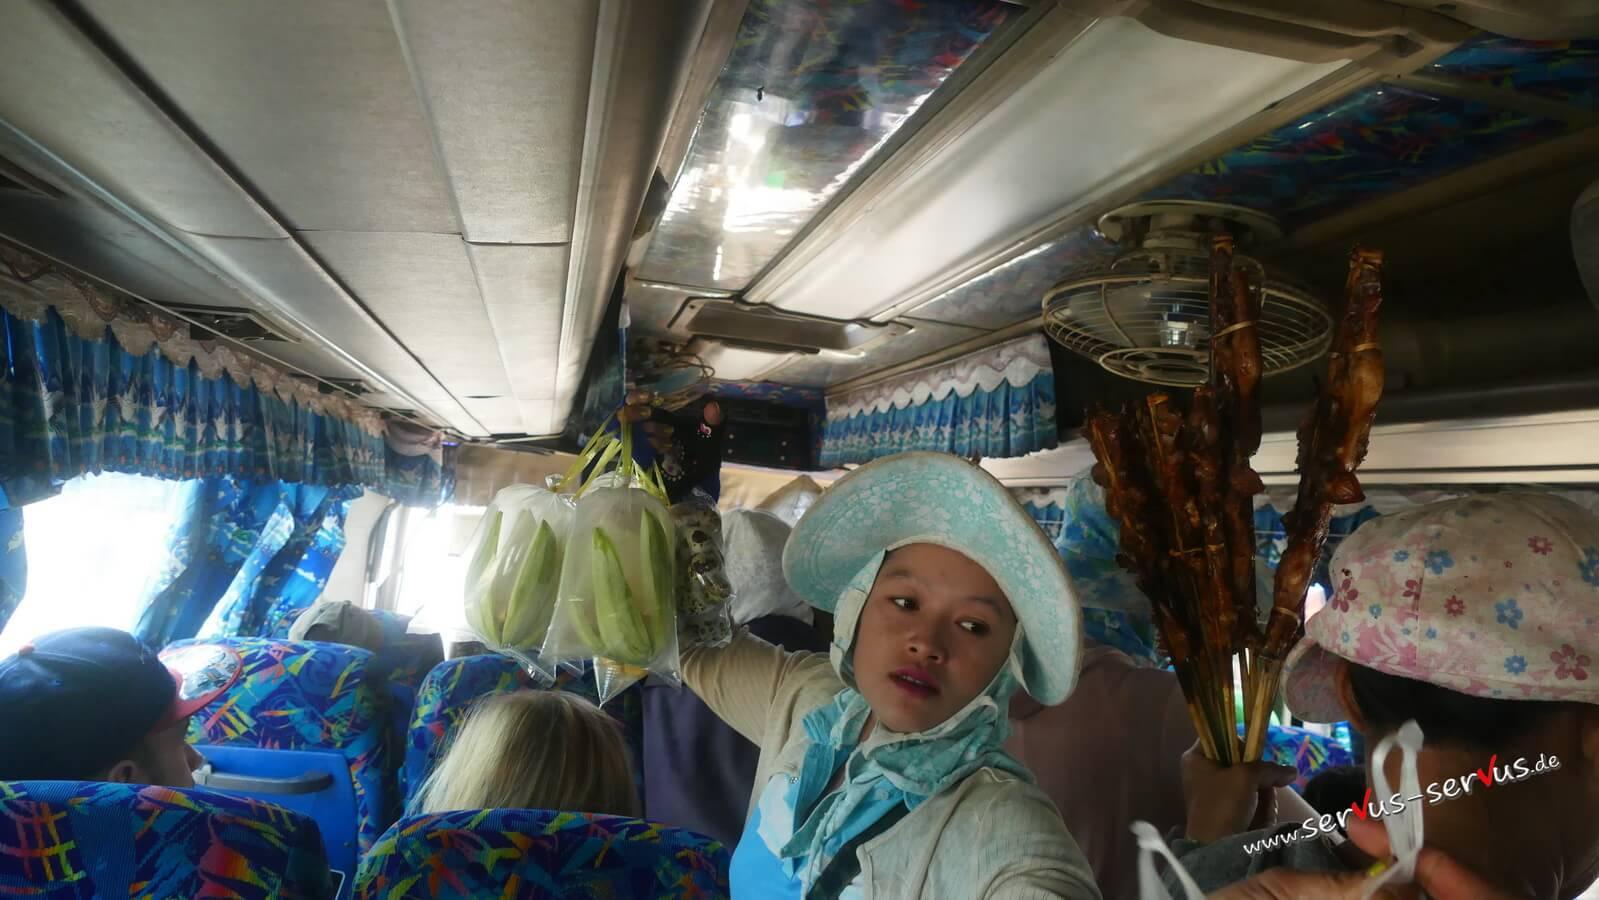 Händler im Bus, Laos, Kong Lor Höhle